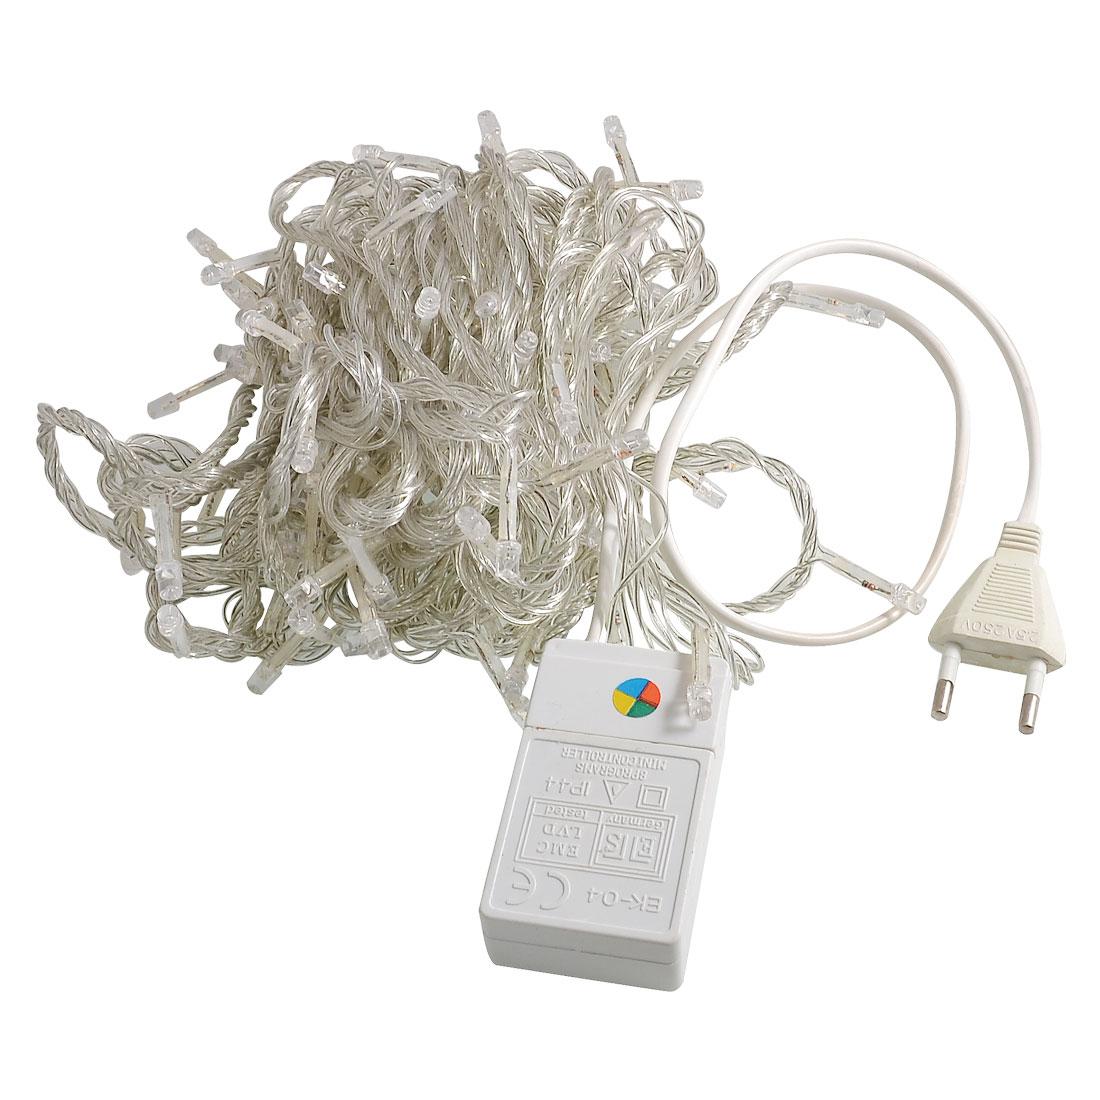 EU Plug Colorful Light 100 LEDs 8 Modes Night String Lights 9.6M AC 110V